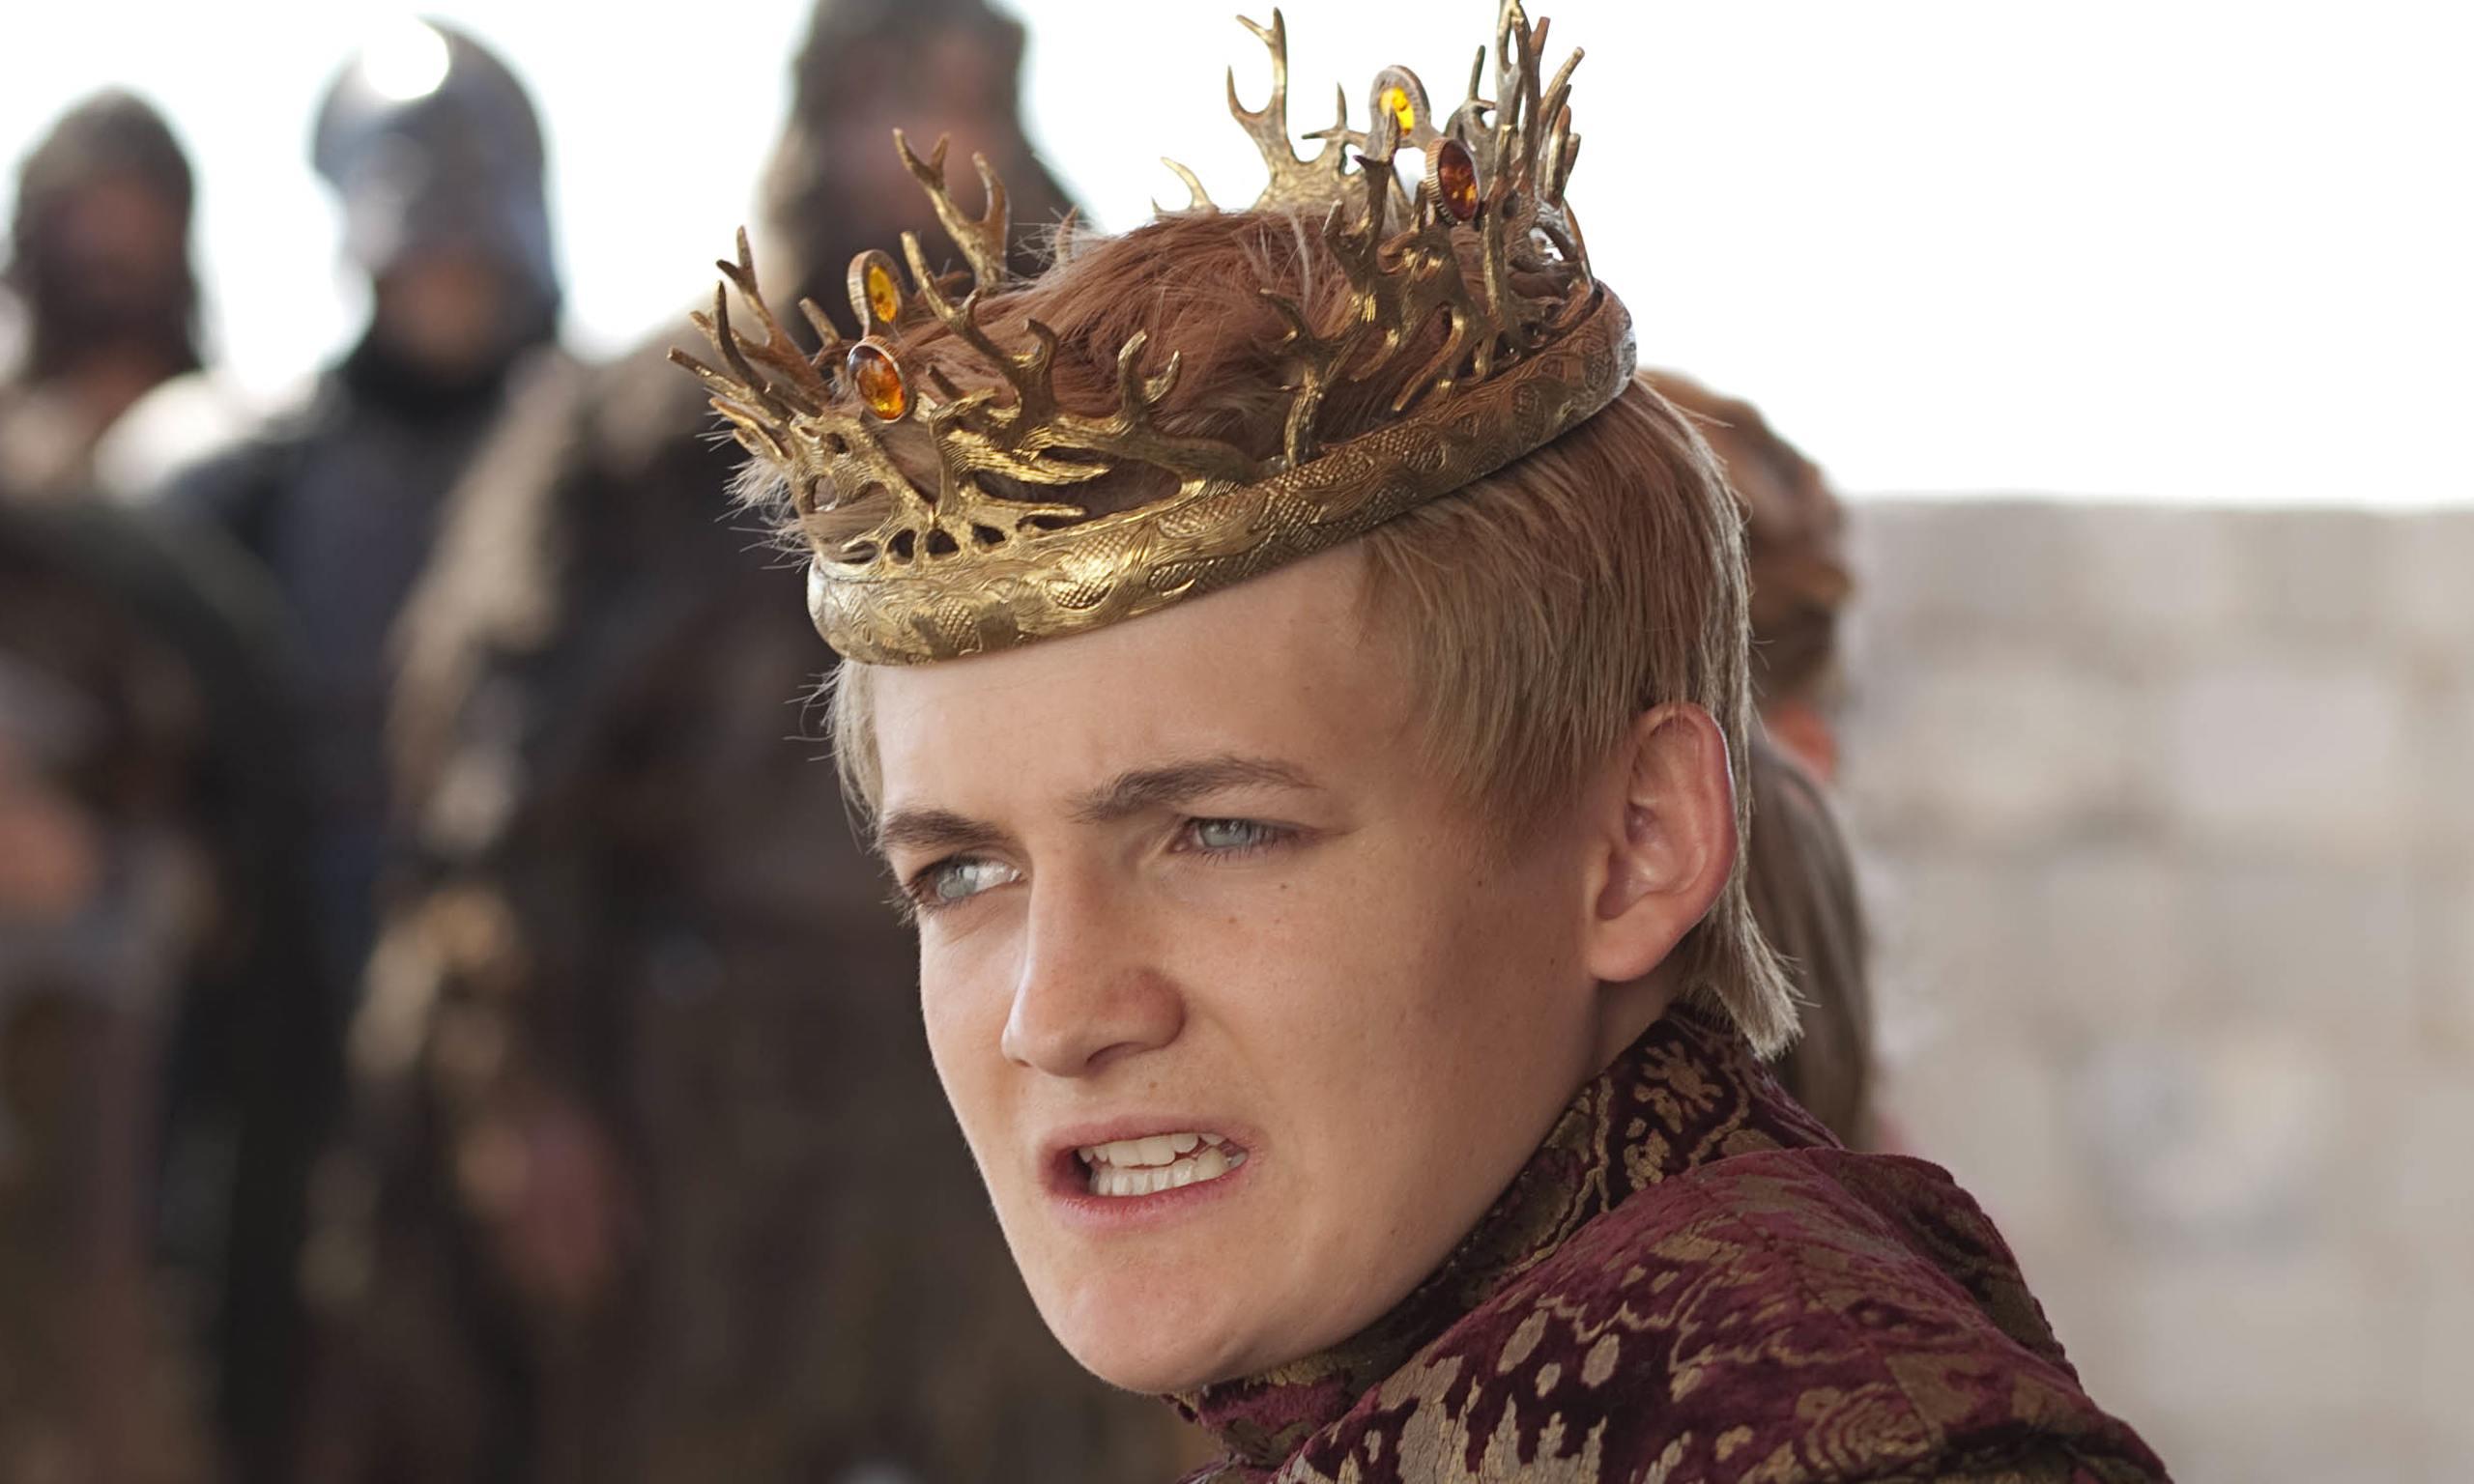 Game of Thrones' top tyrant: King Joffrey Baratheon ...